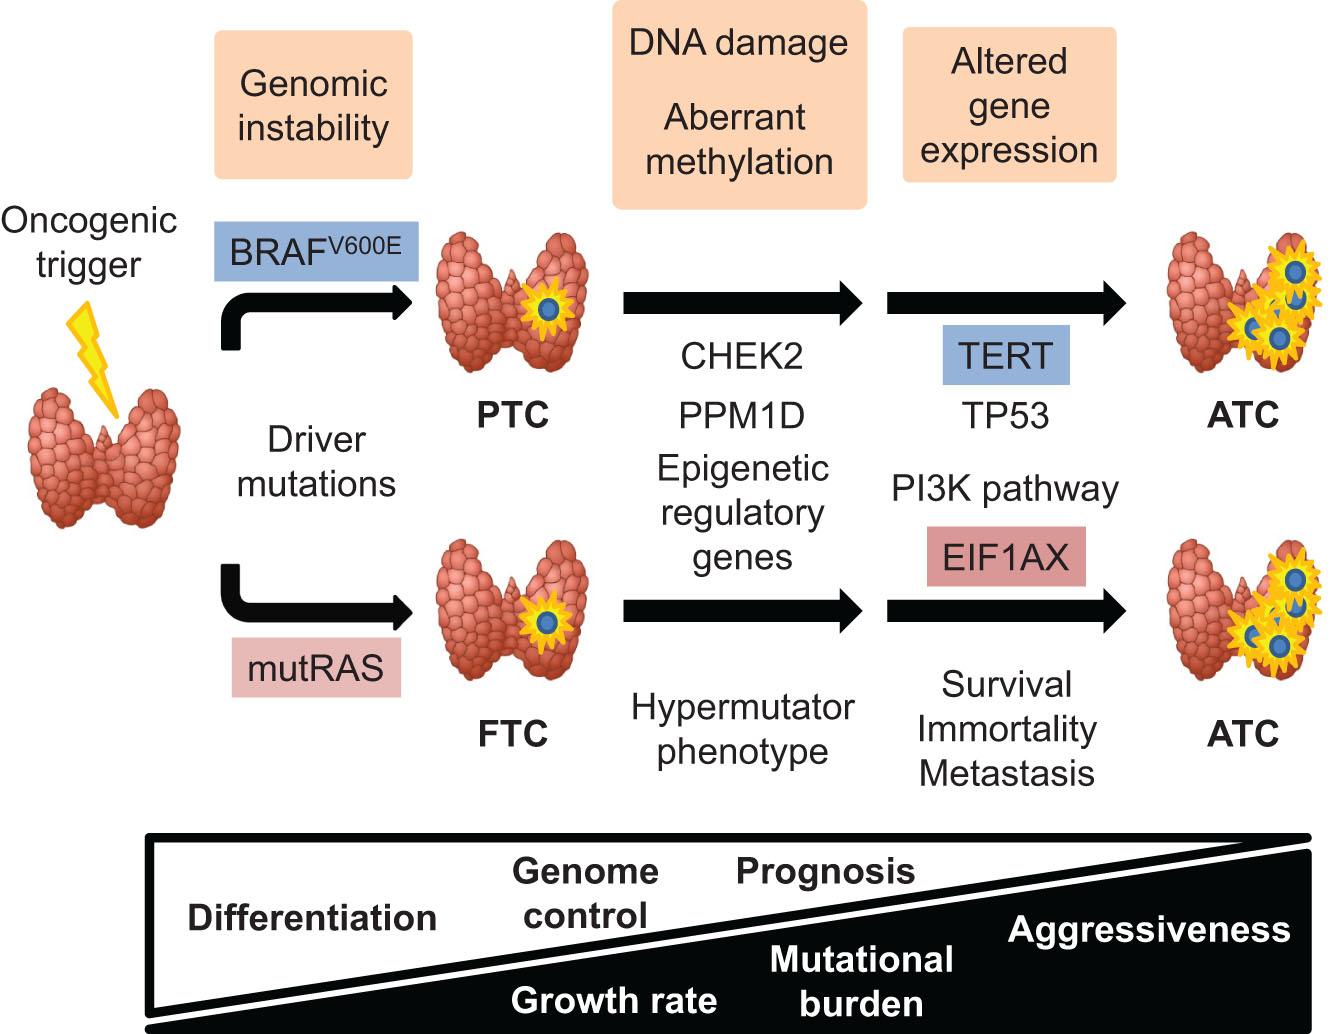 Regulators of the RAS-ERK pathway as therapeutic targets in